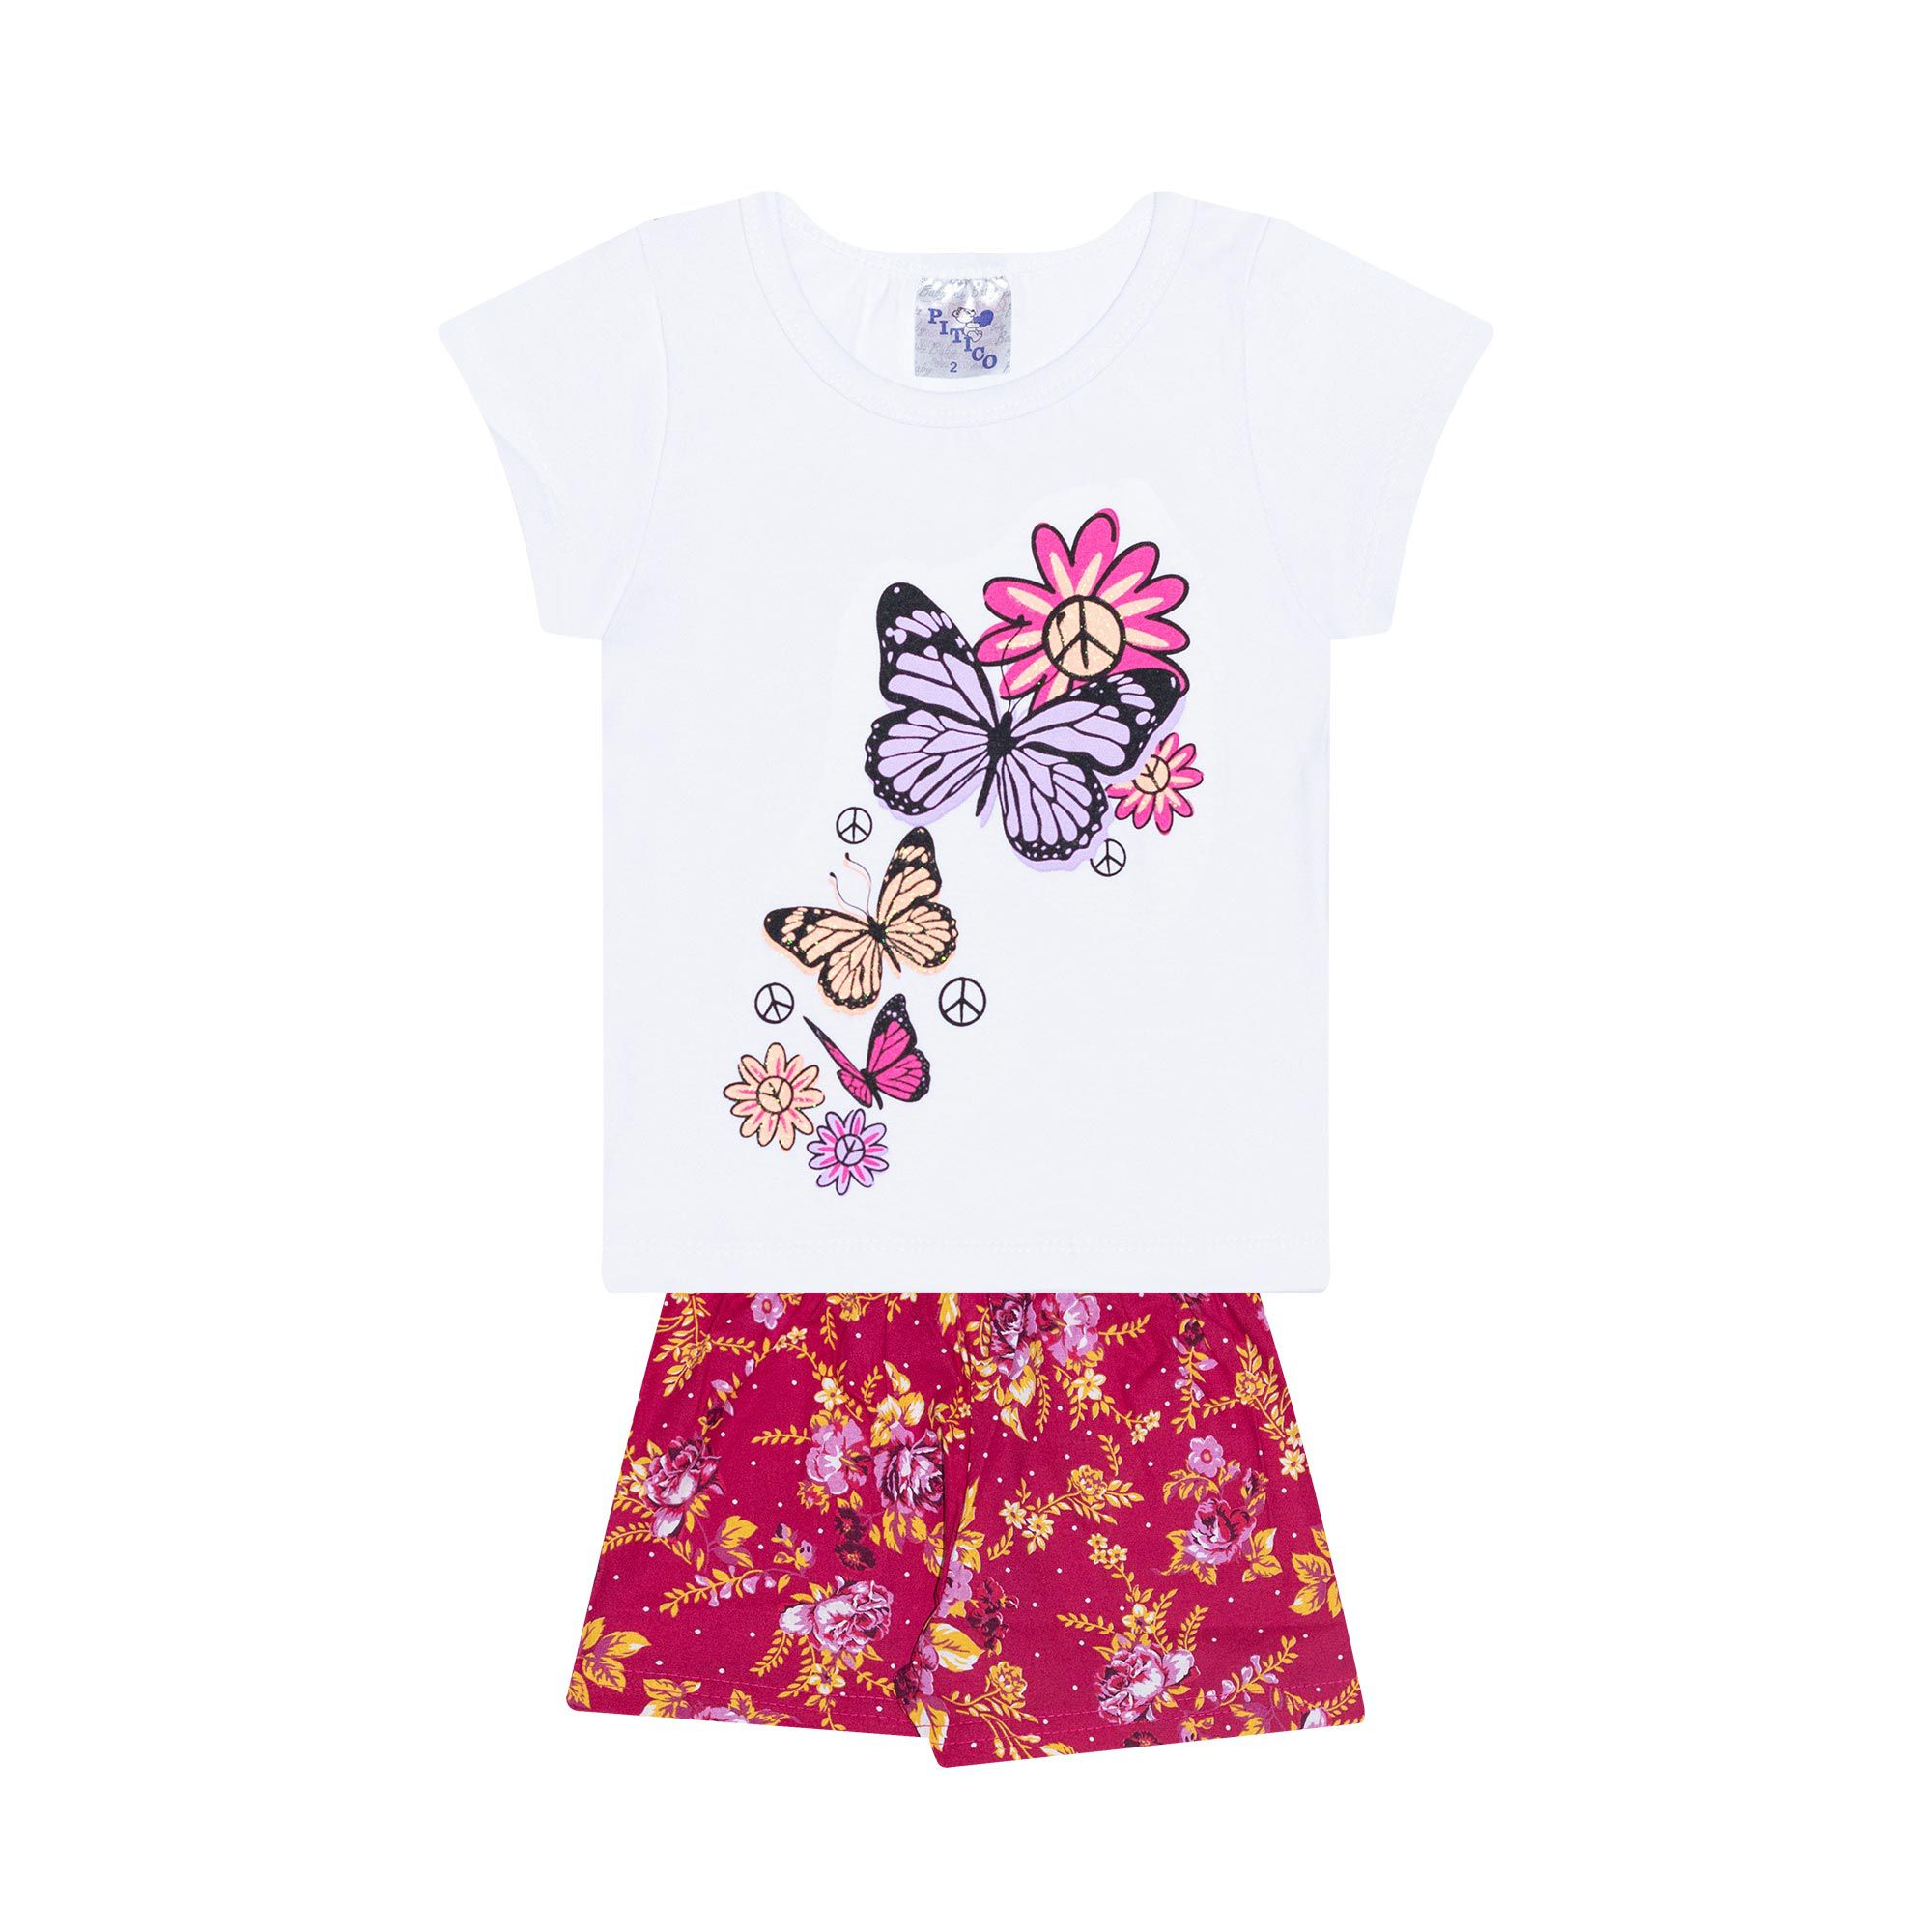 Conjunto Infantil Feminino - Ref 1006 - Branco/Pink - Pitico